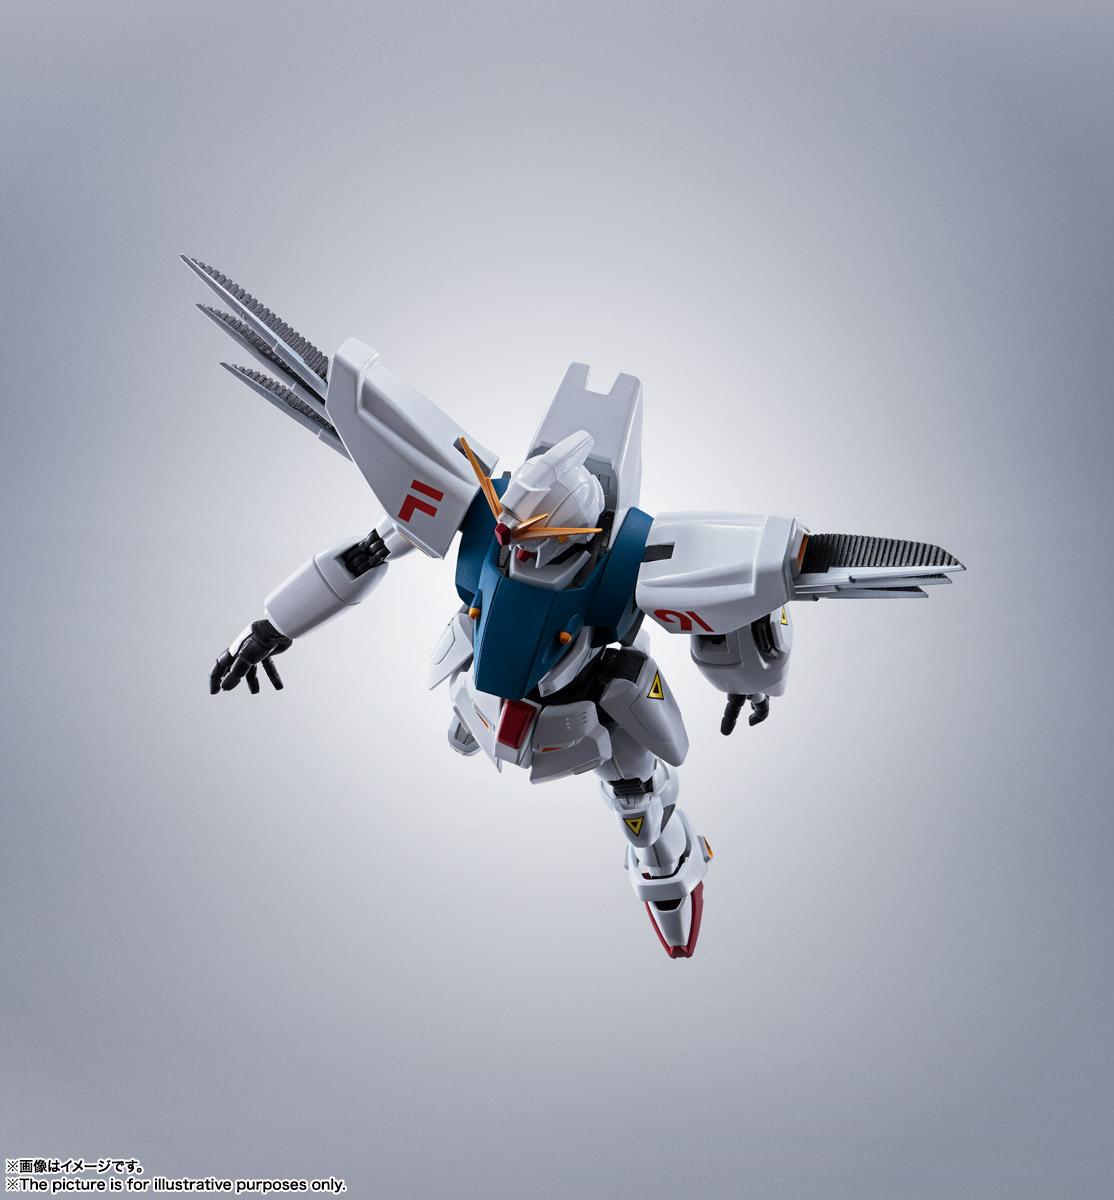 ROBOT魂〈SIDE MS〉『ガンダムF91 EVOLUTION-SPEC』機動戦士ガンダムF91 可動フィギュア-013